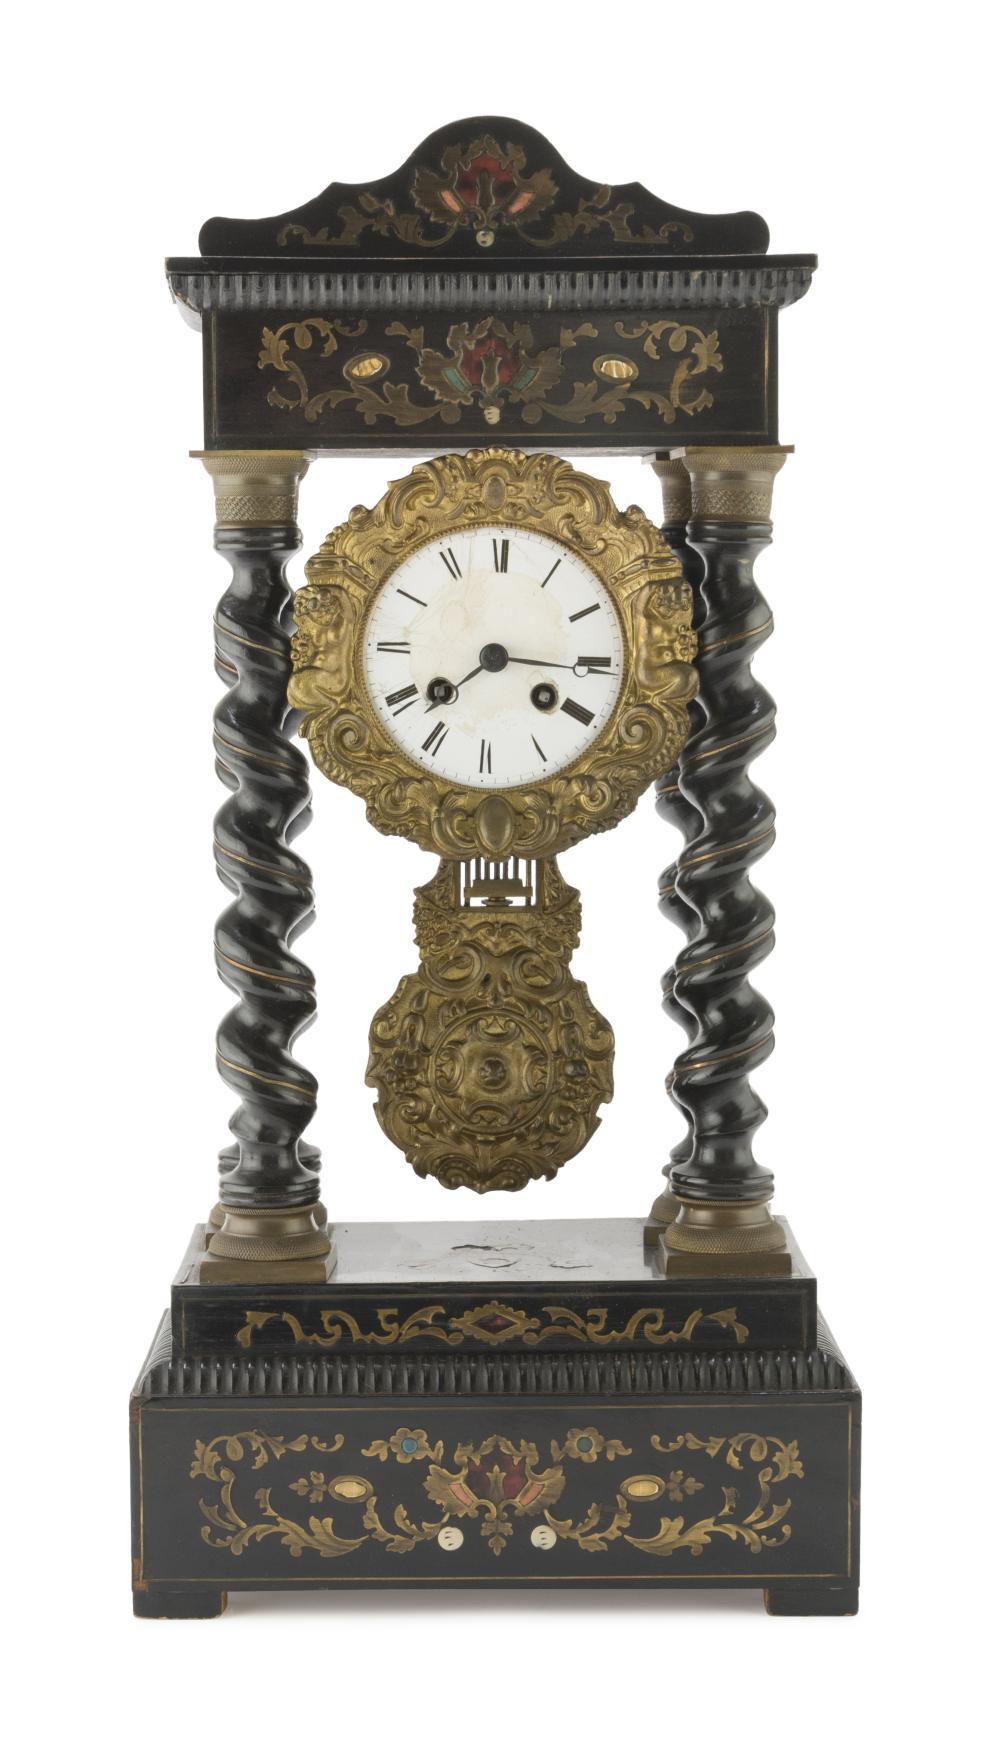 Lot 402: TEMPLE CLOCK IN EBONIZED WOOD, 19TH CENTURY